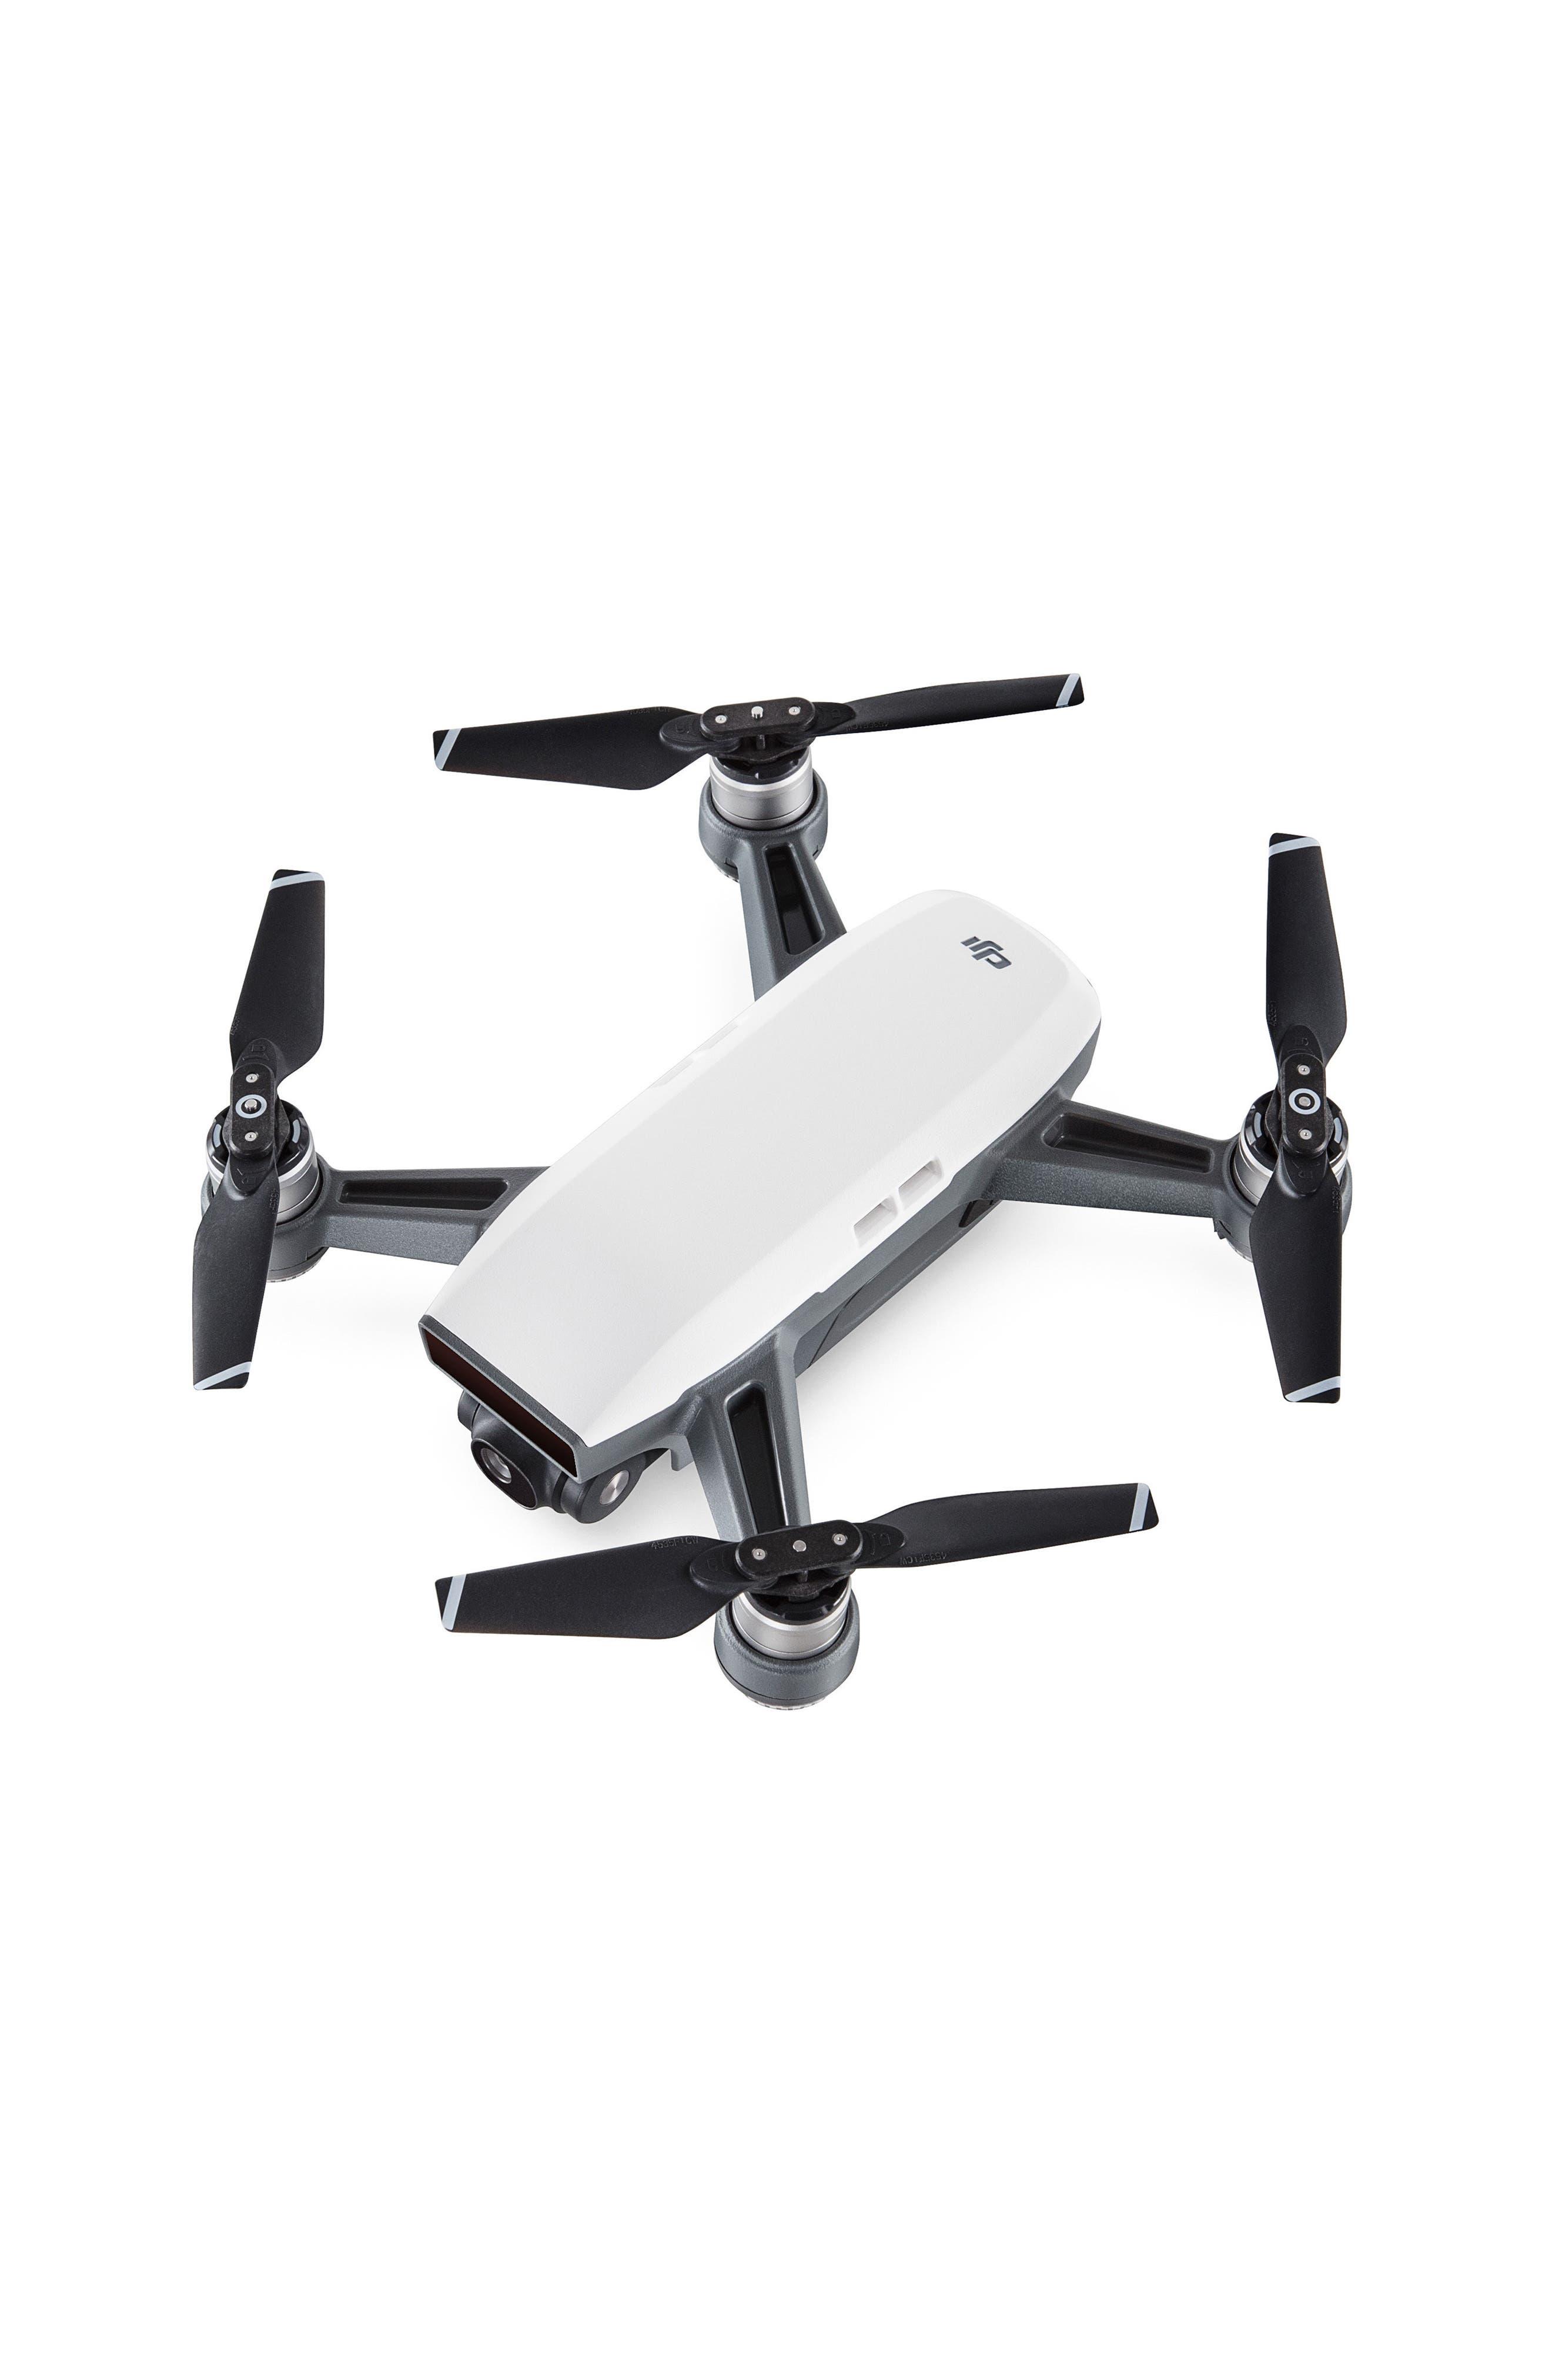 Spark Mini Flying Quadcopter,                             Main thumbnail 1, color,                             White